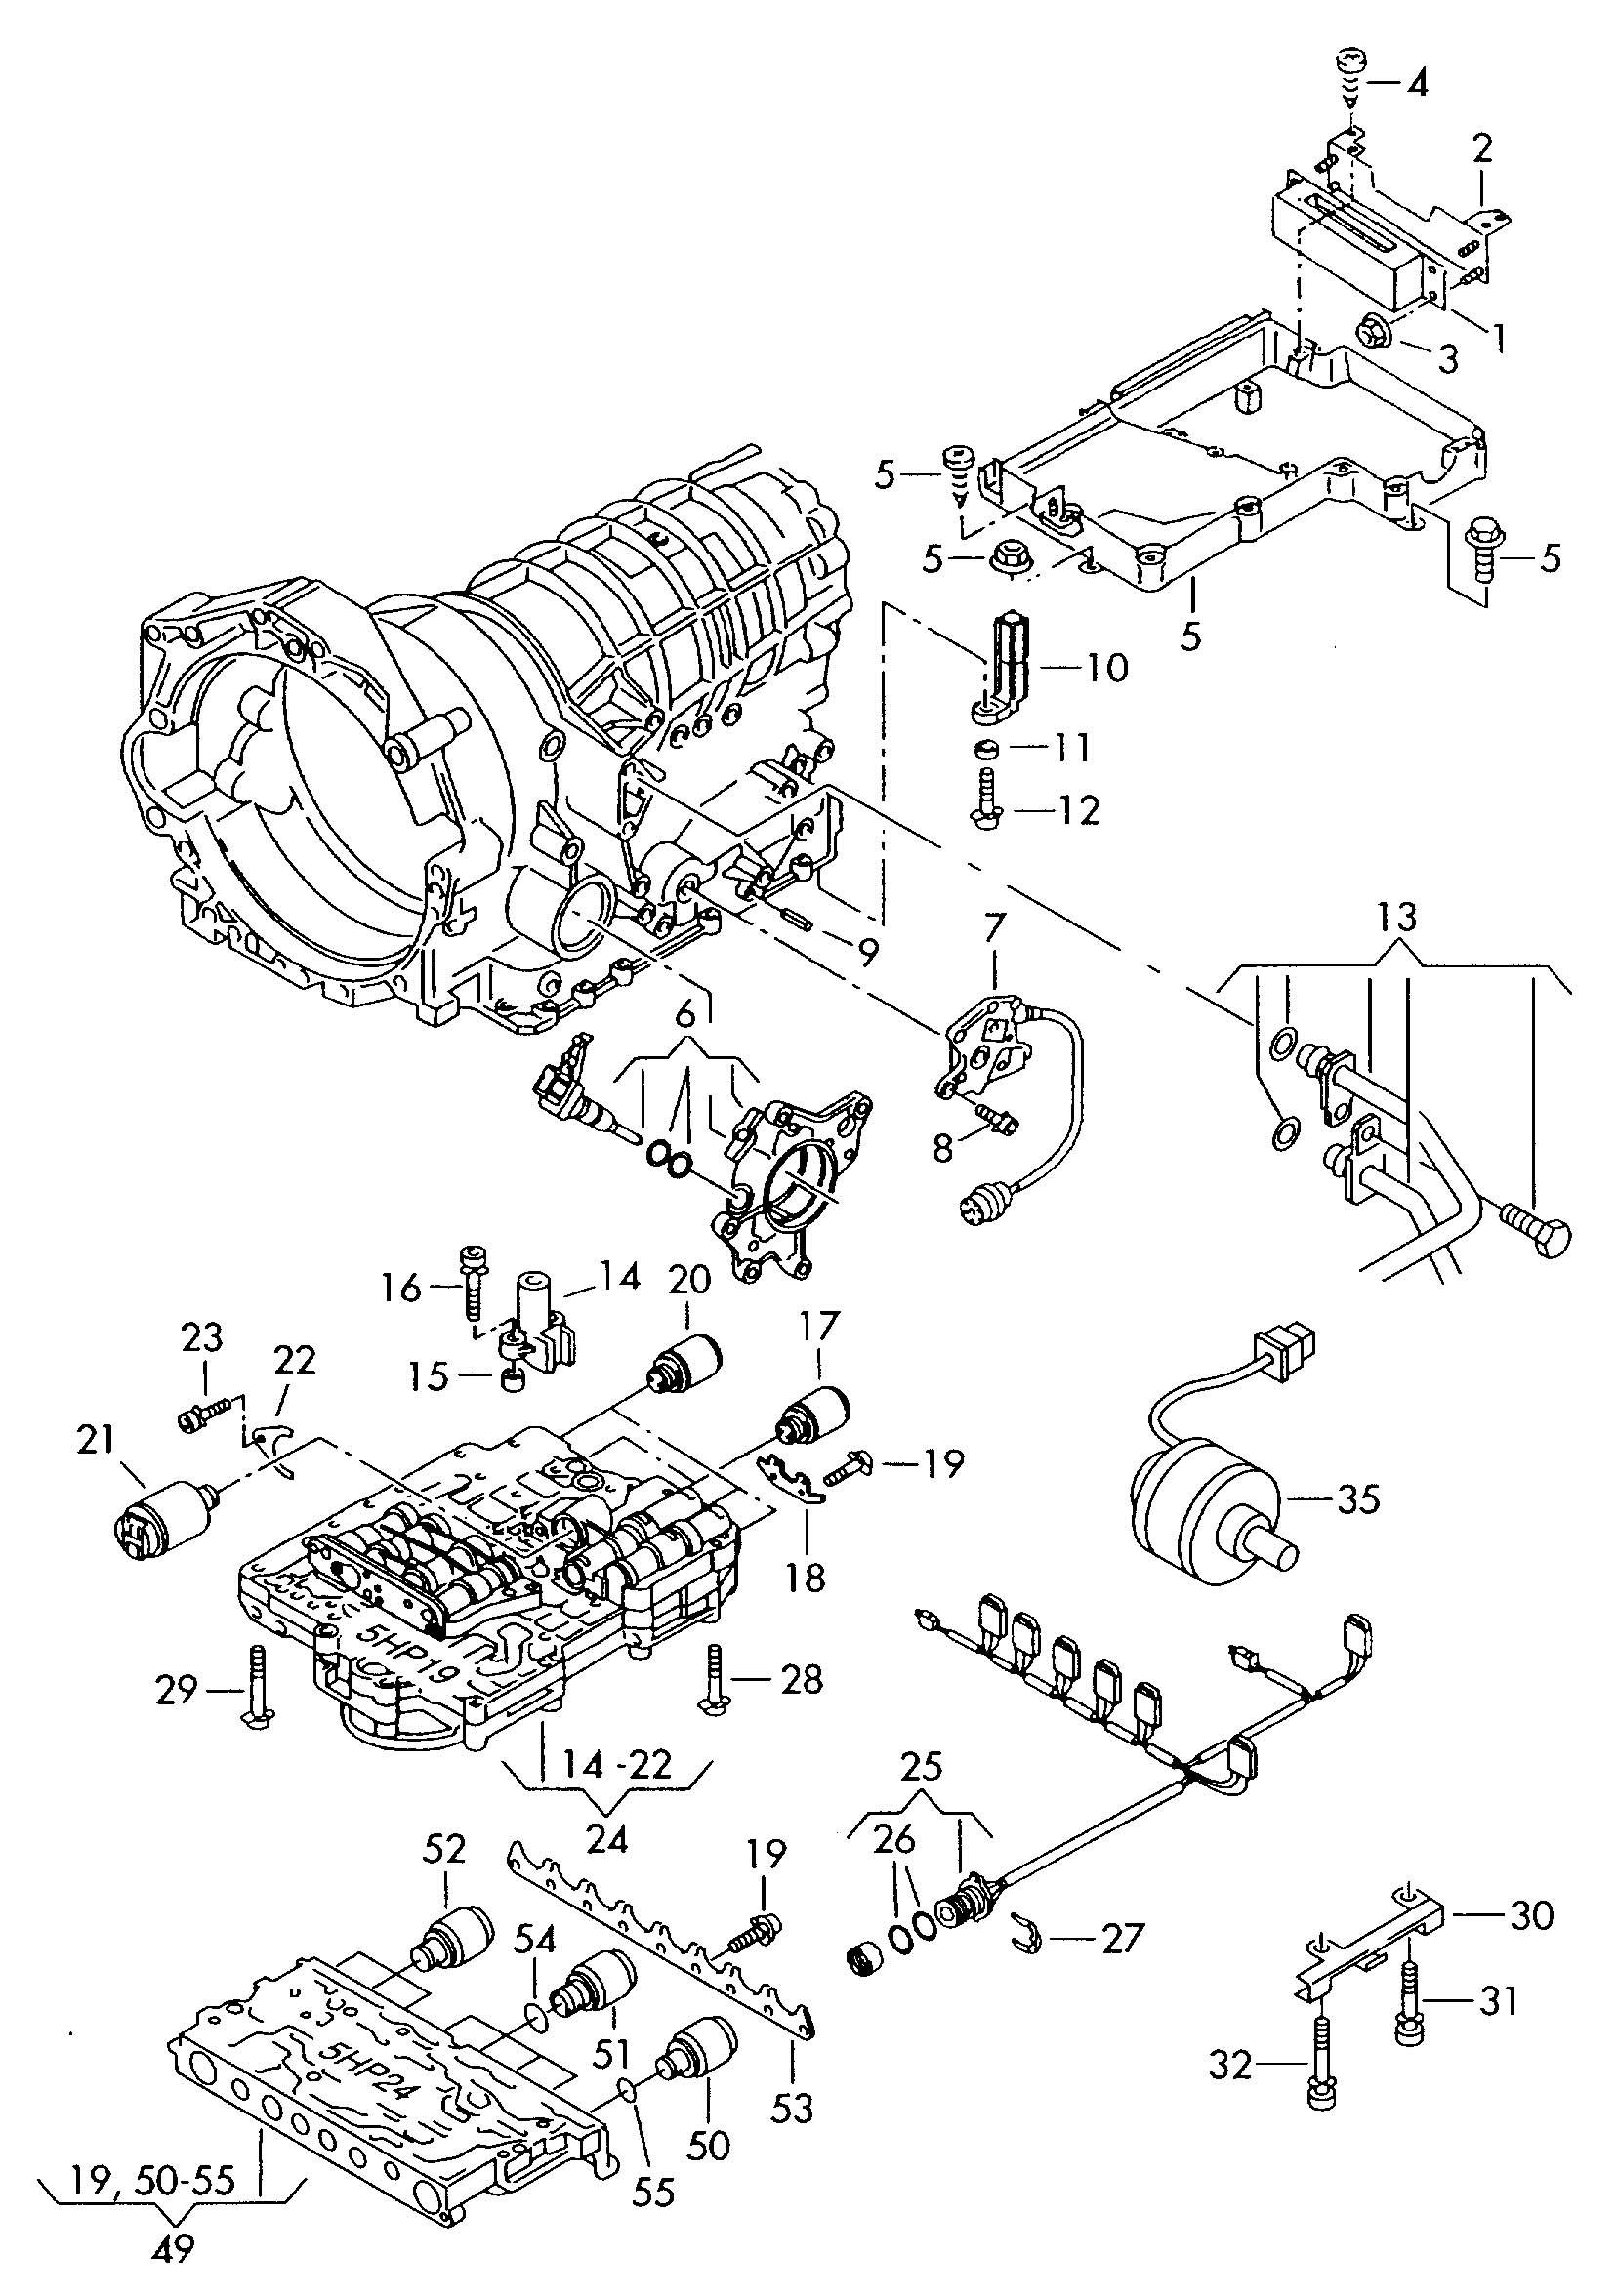 hight resolution of 1998 volkswagen jetta engine diagram bull wiring diagram for free 1998 vw jetta engine diagram